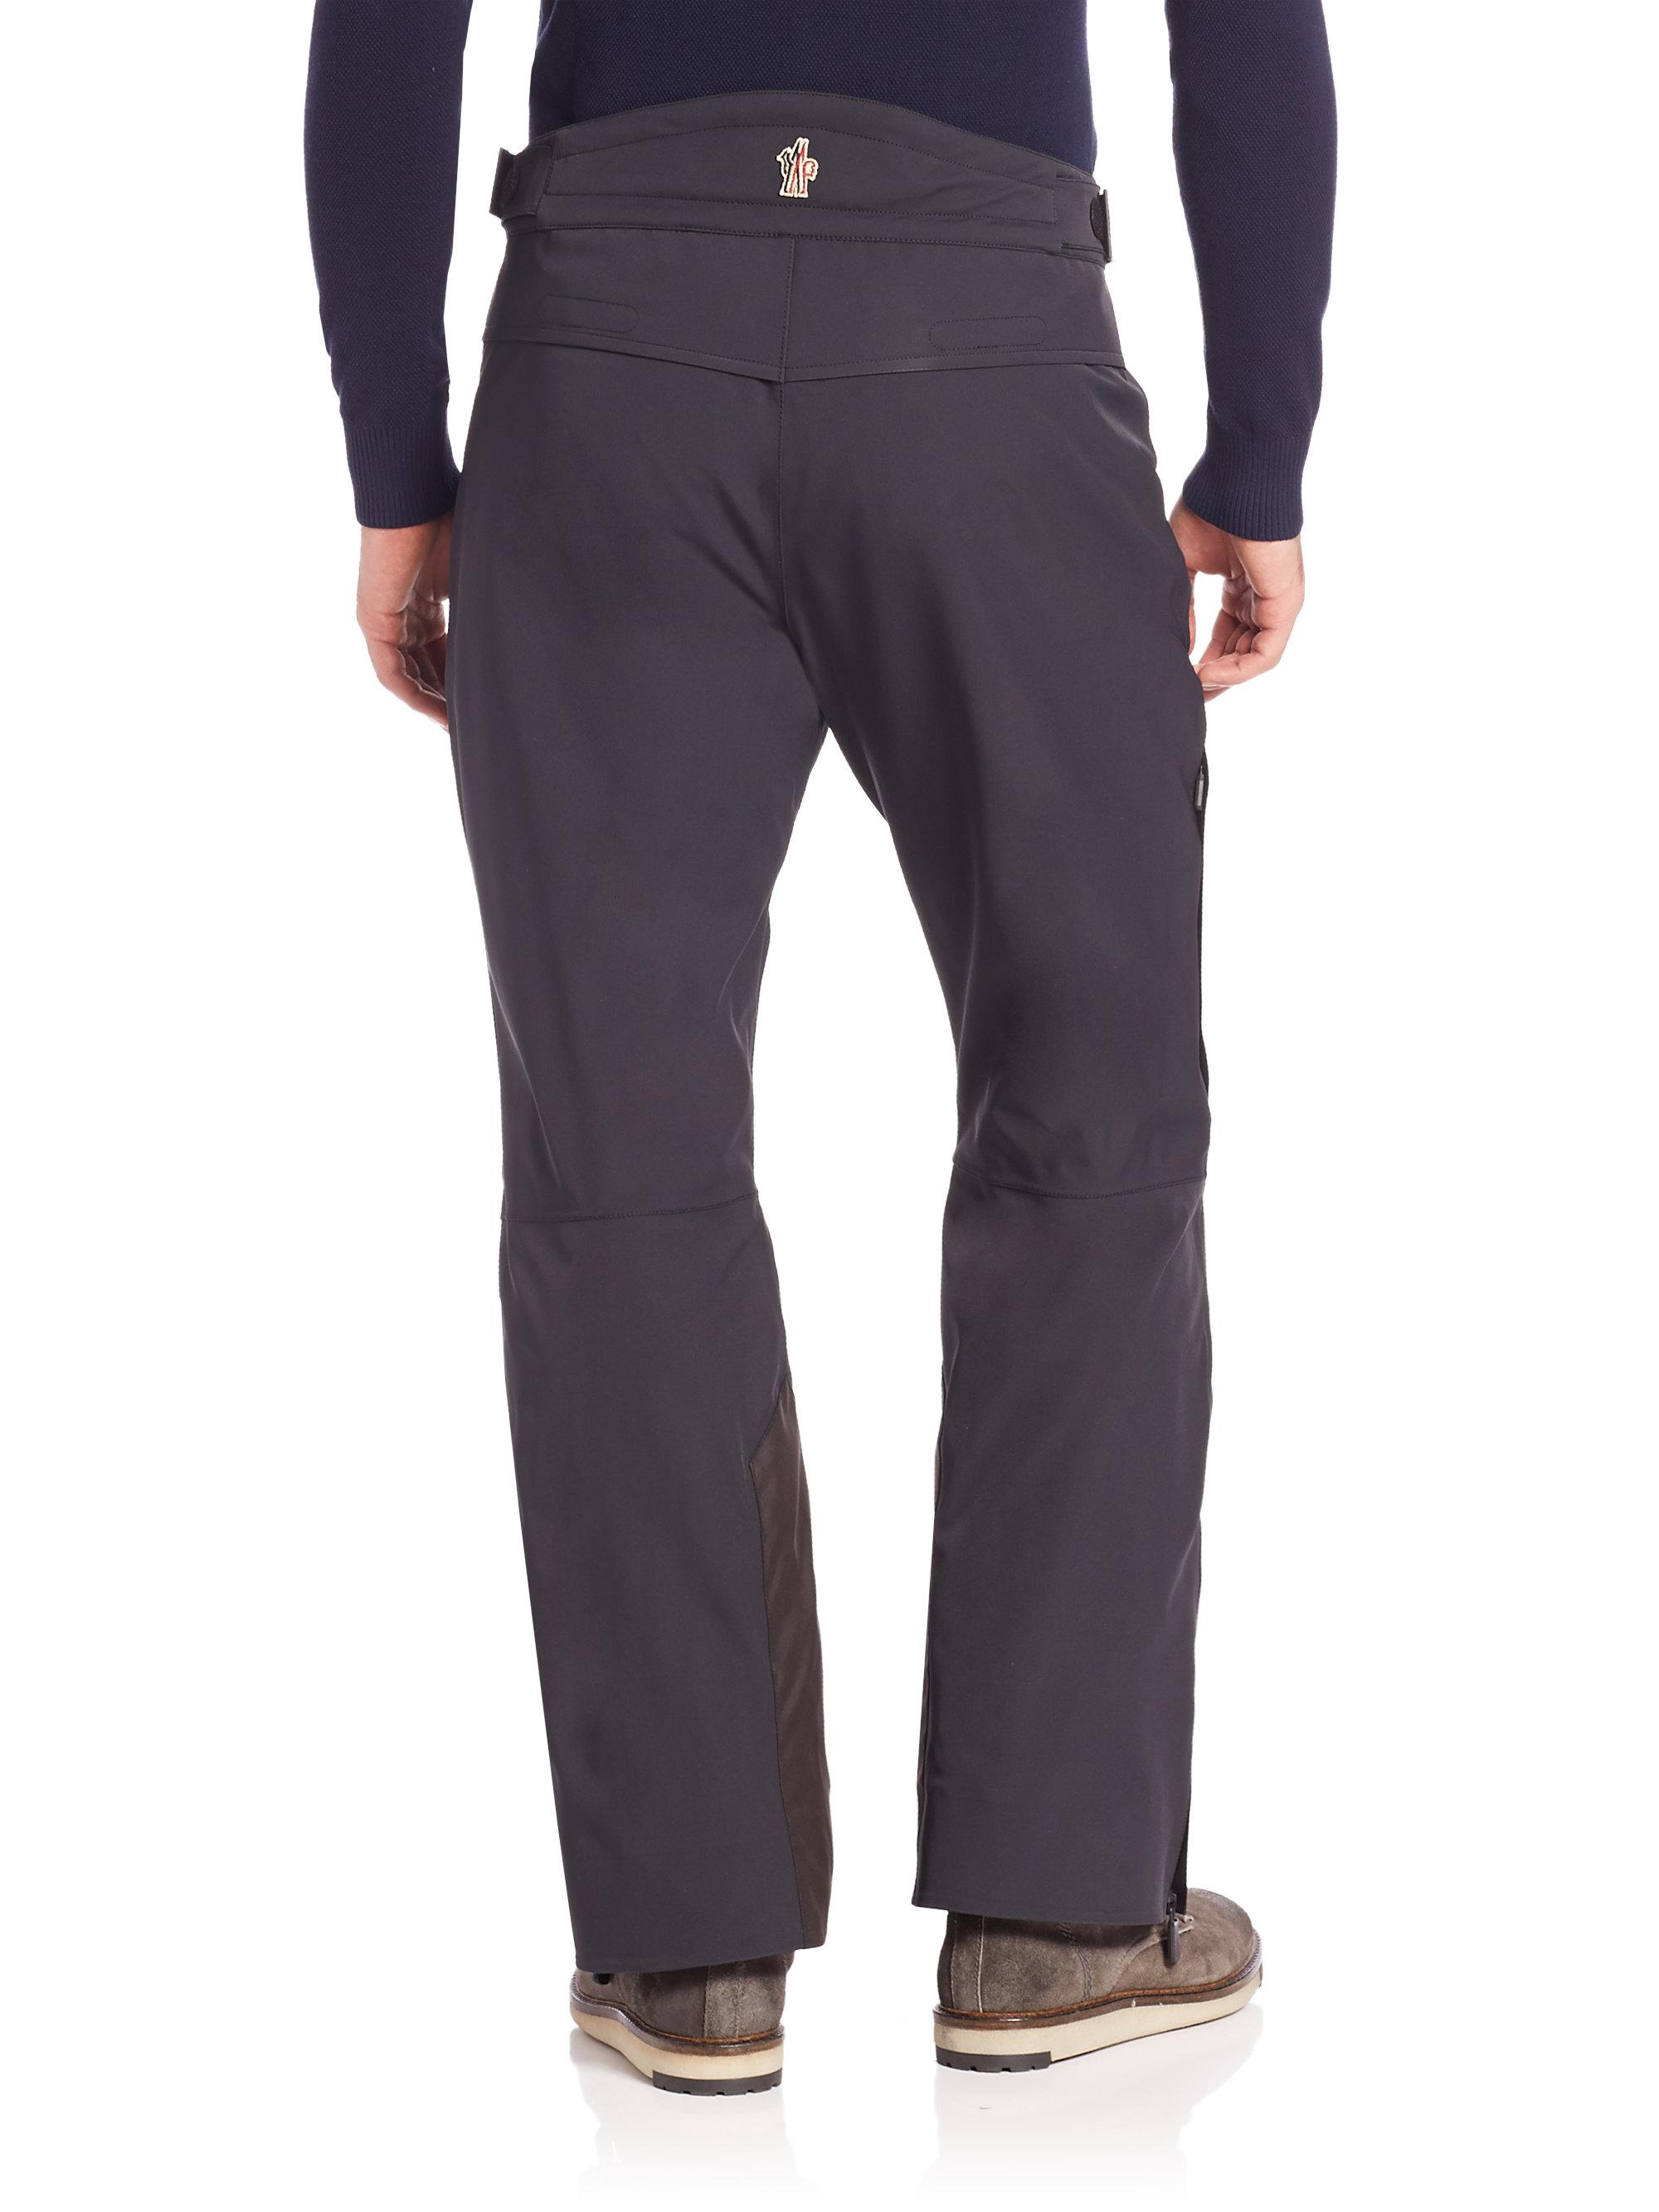 e41afbc3b2 Lyst - Moncler Ski Trousers in Blue for Men